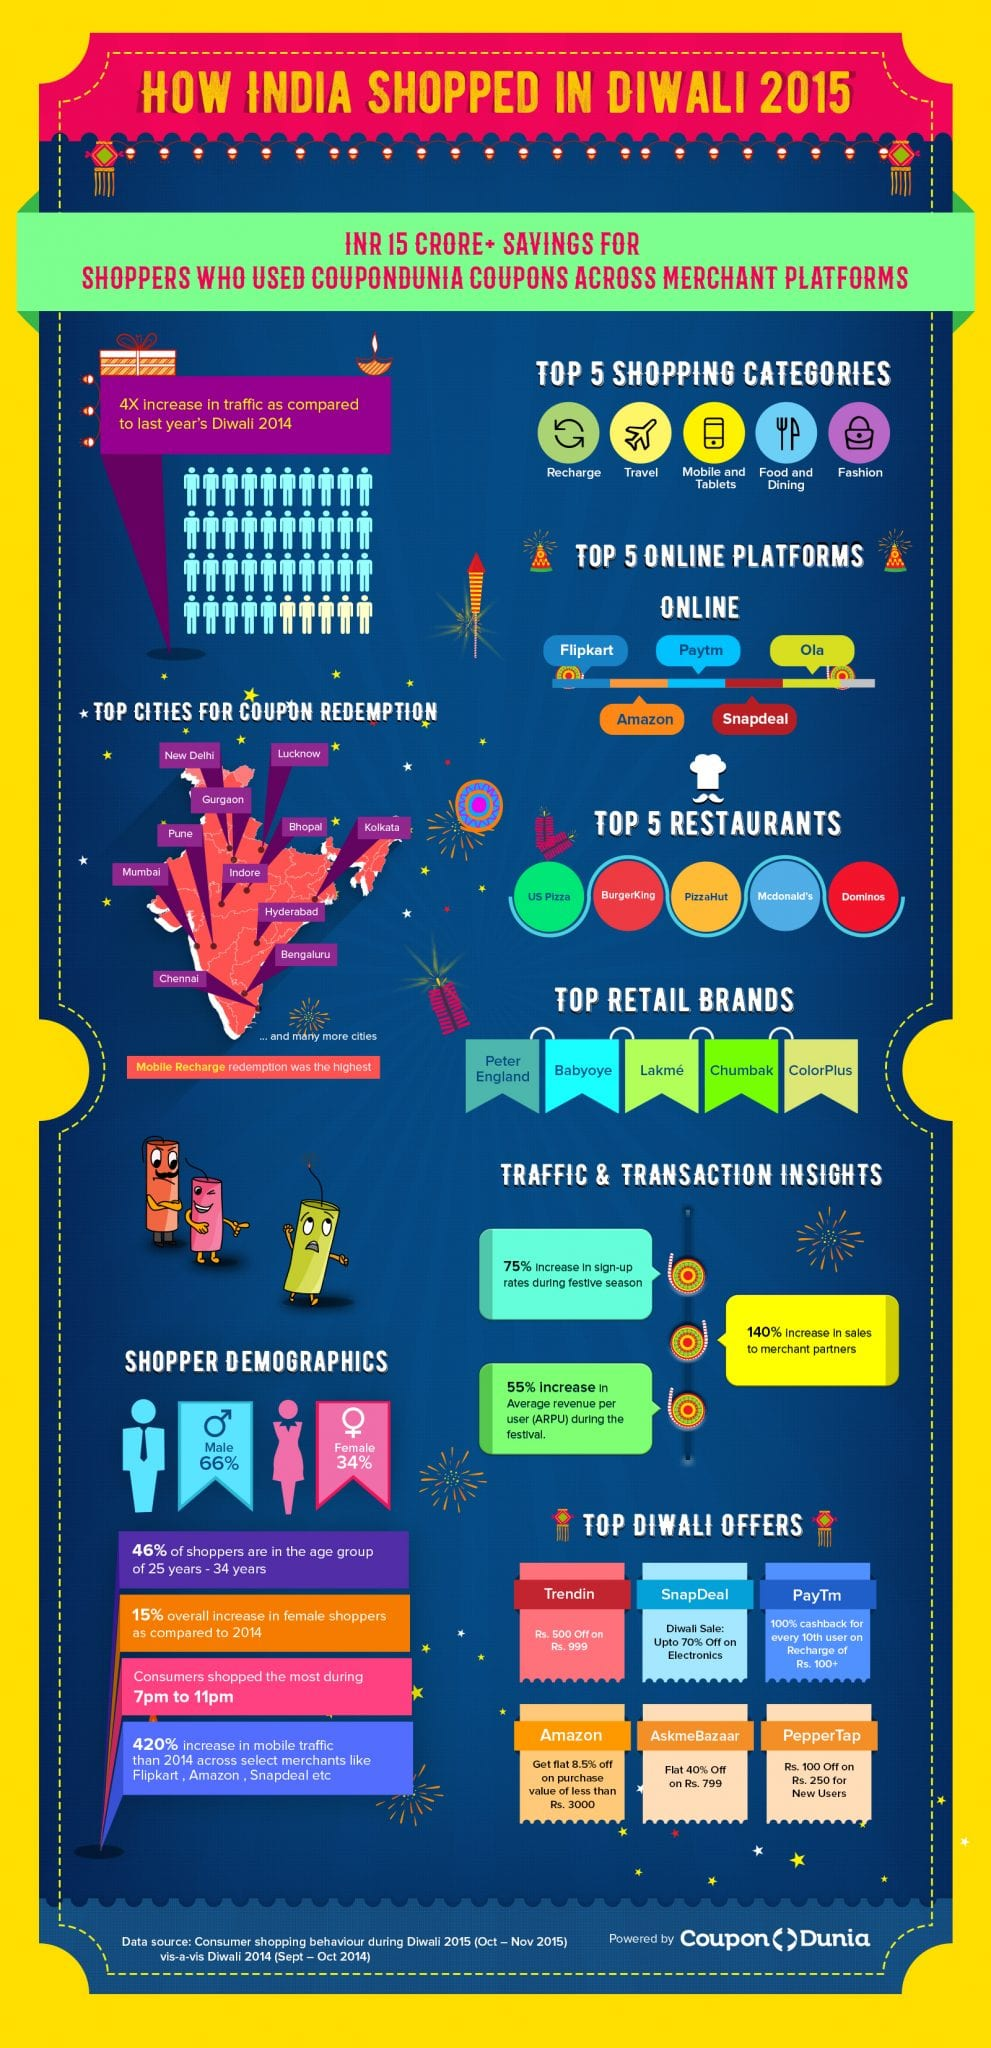 diwali-infographic-v5